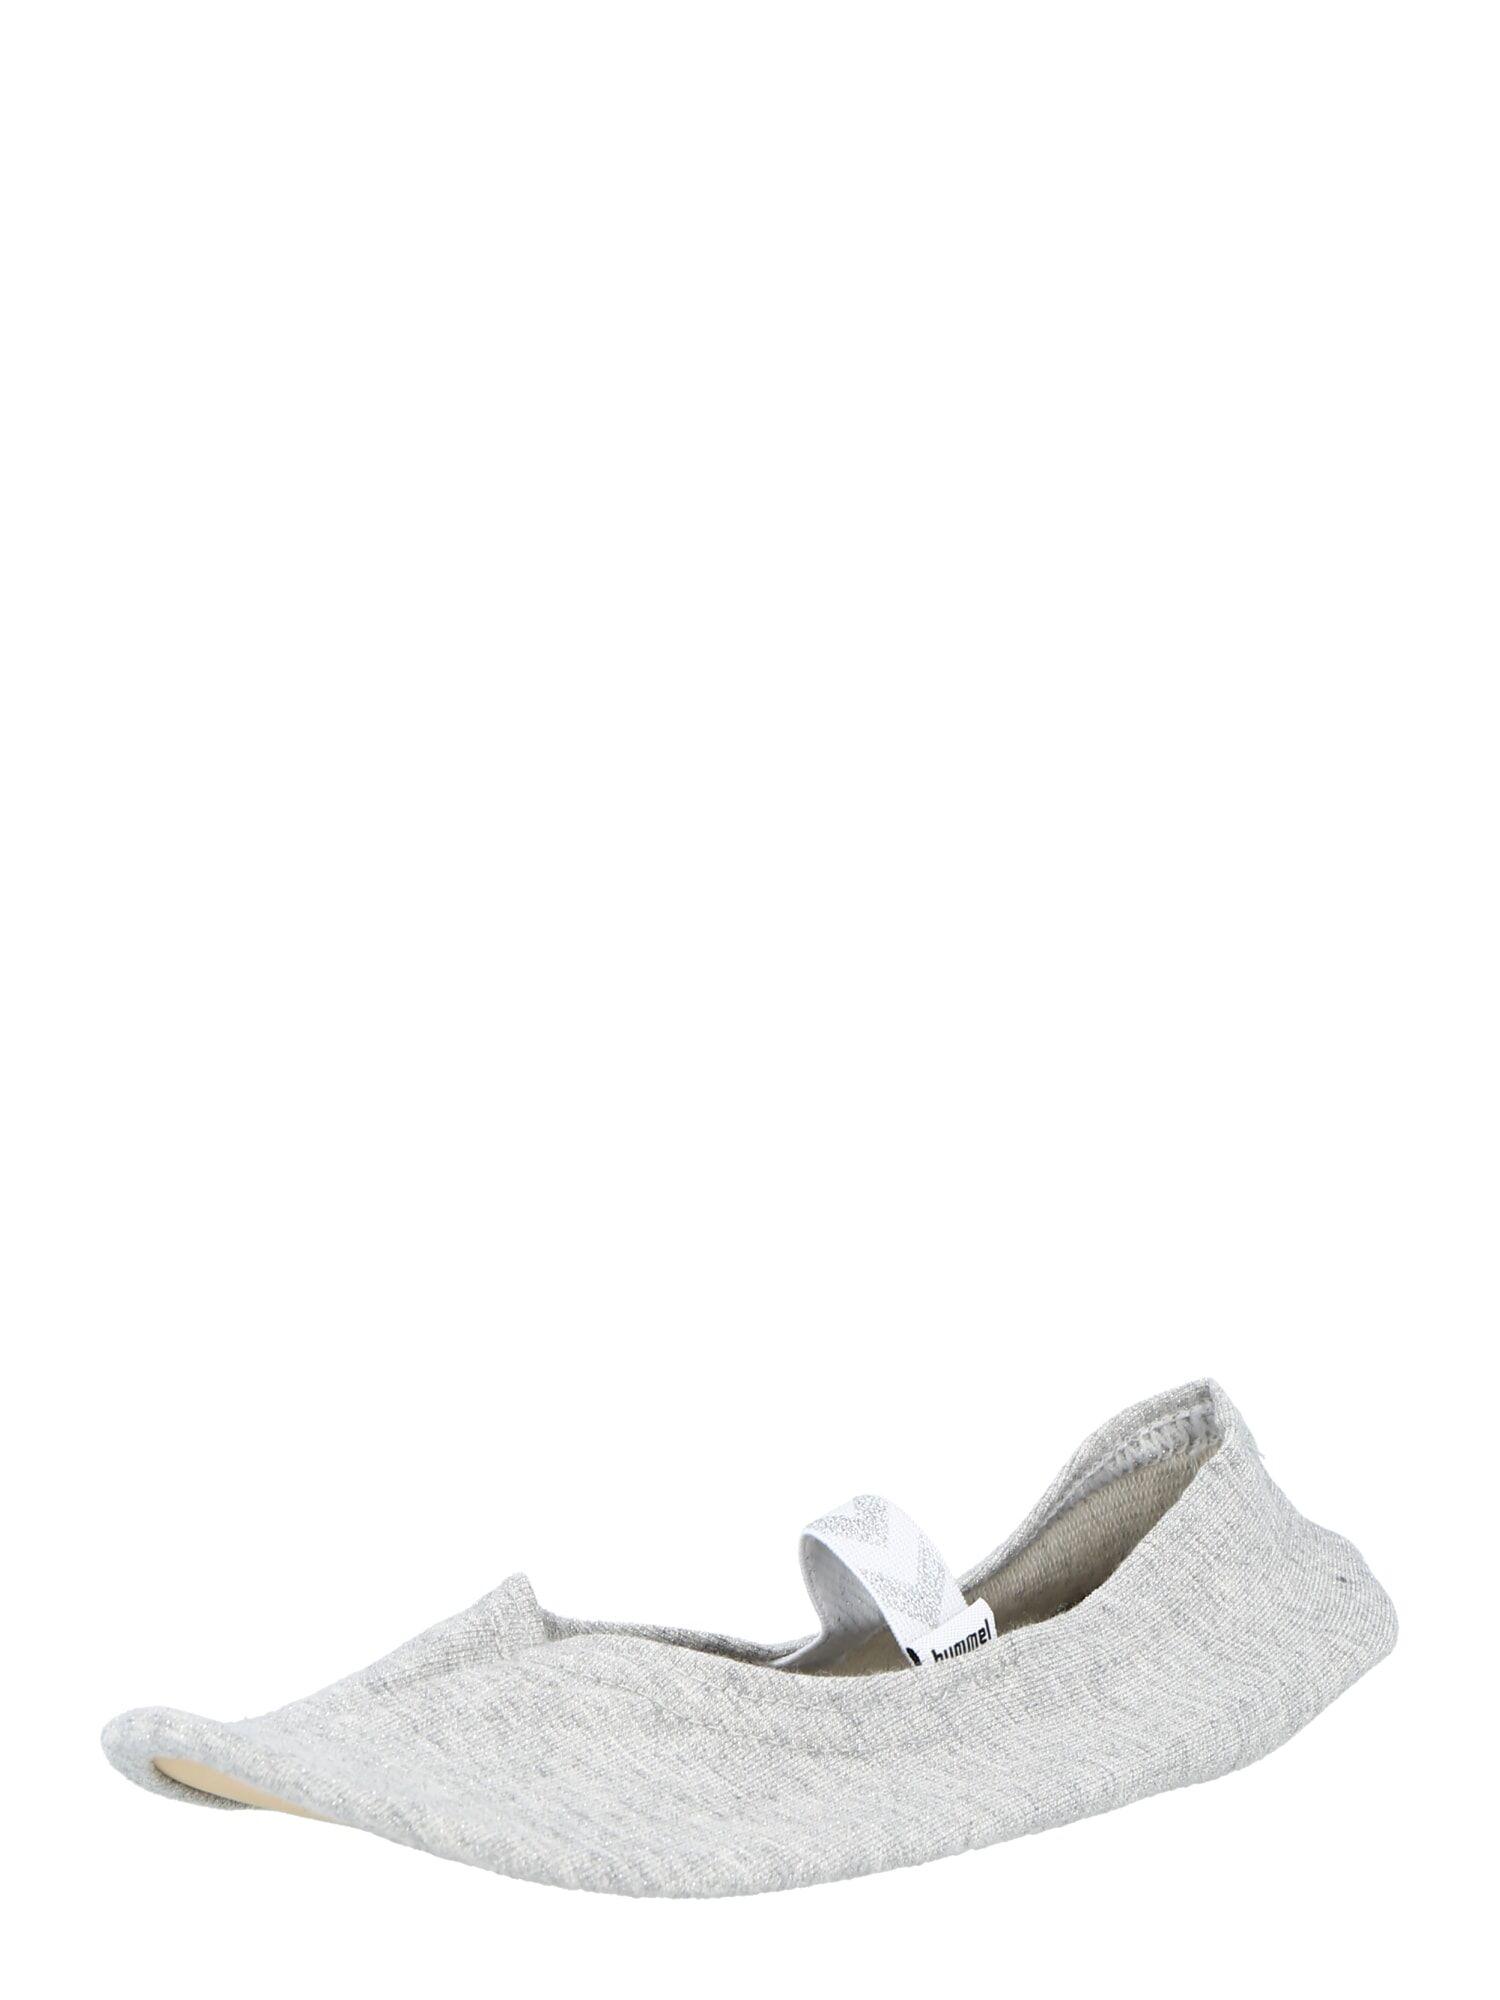 Hummel Chaussure de sport  - Gris - Taille: 34 - boy